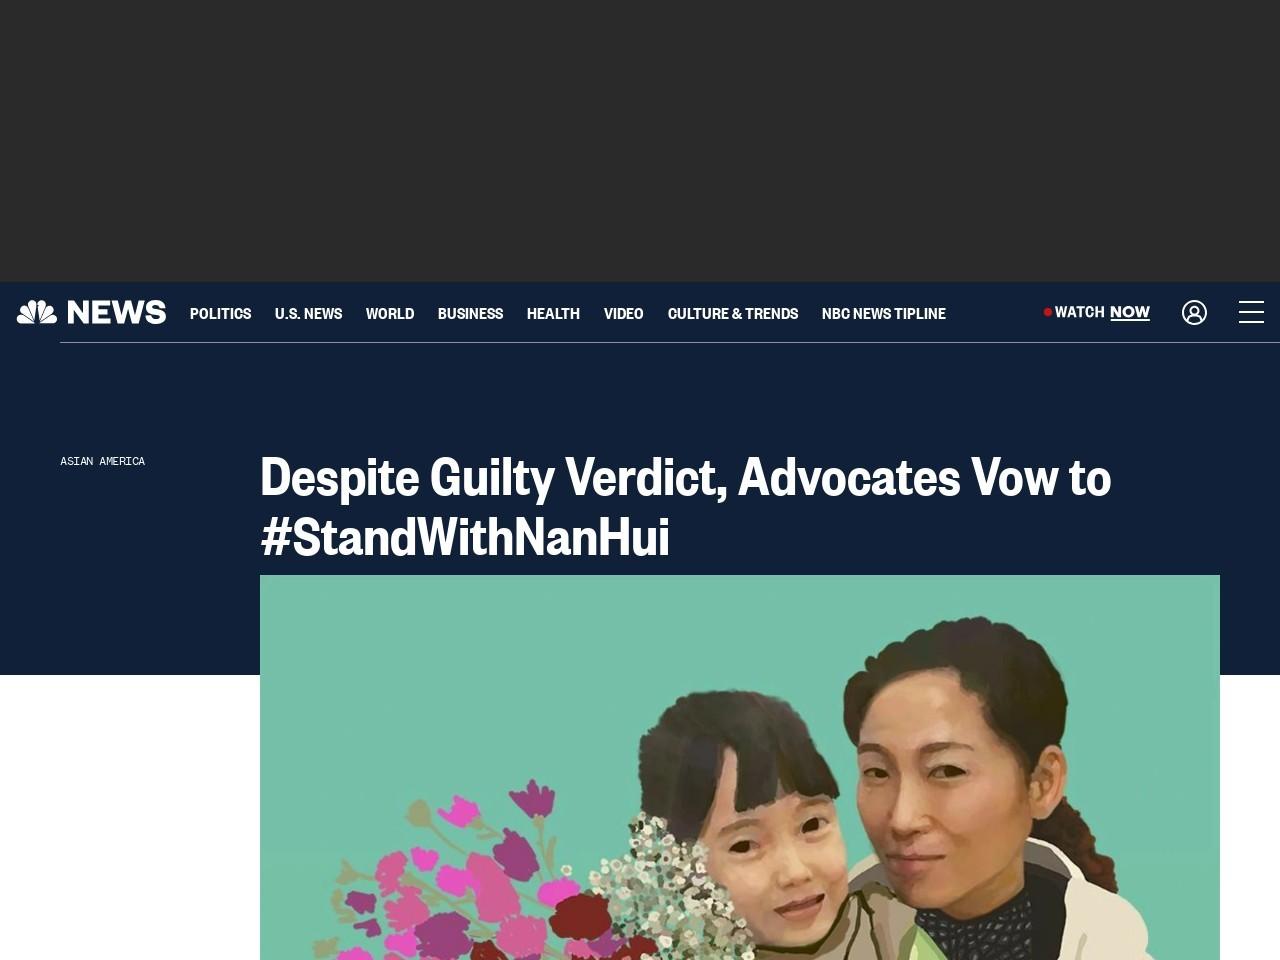 Despite Guilty Verdict, Advocates Vow to #StandWithNanHui